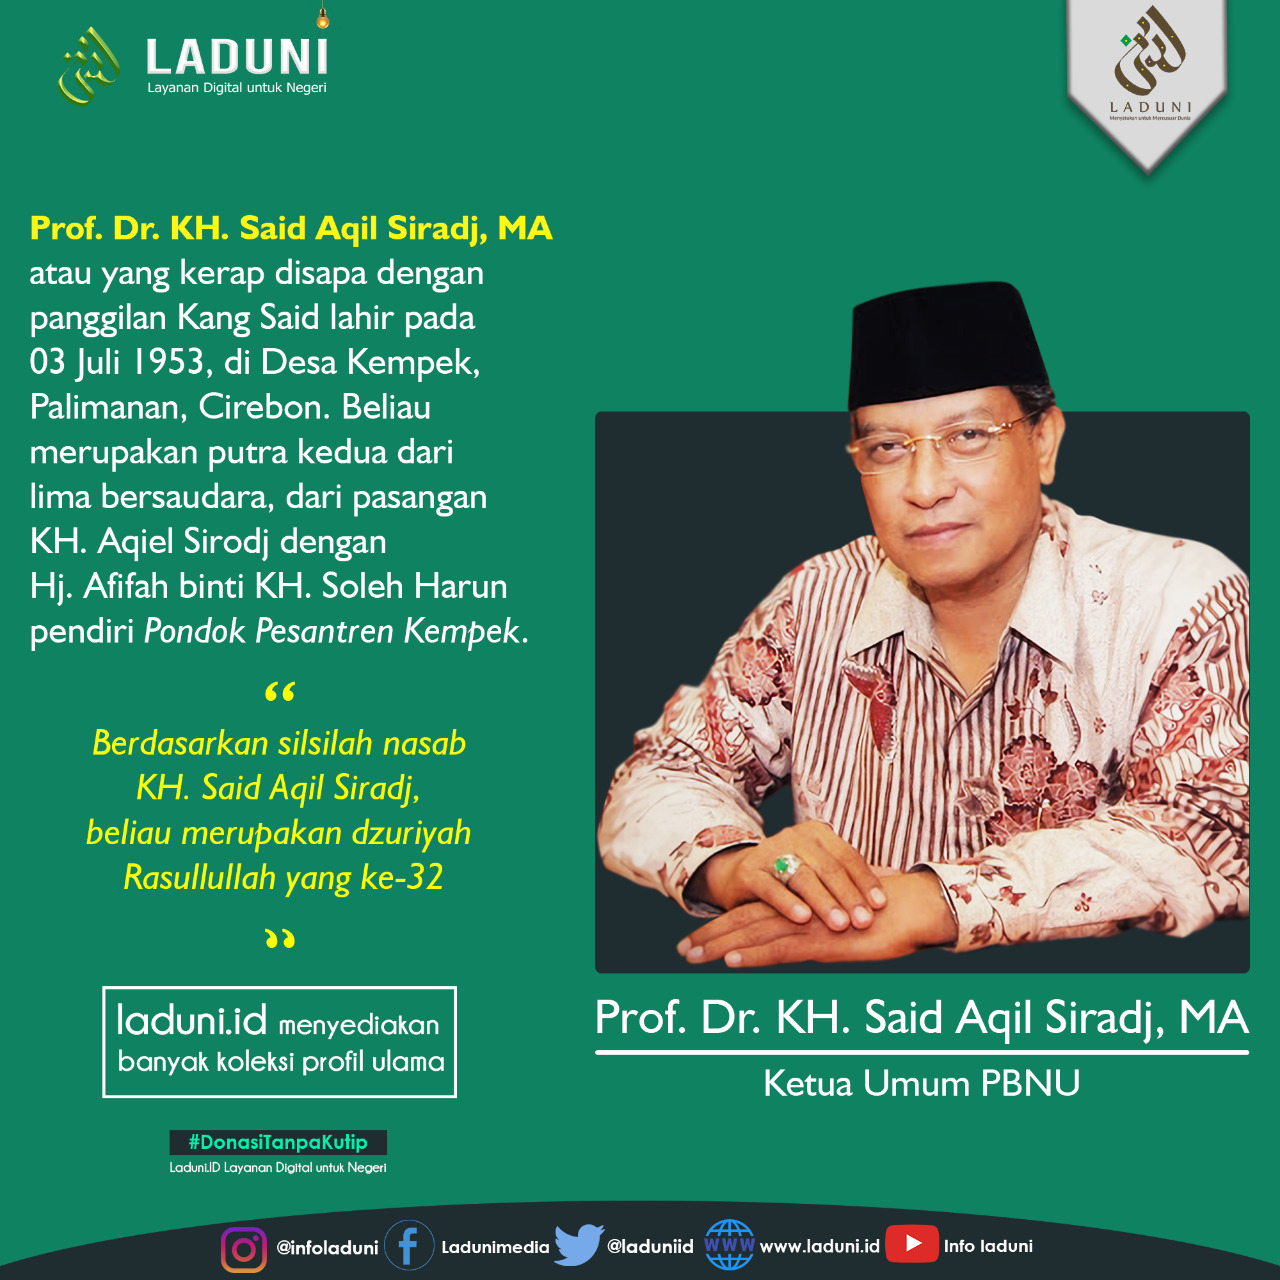 Biography of Prof. Dr. KH. Said Aqil Sirodj